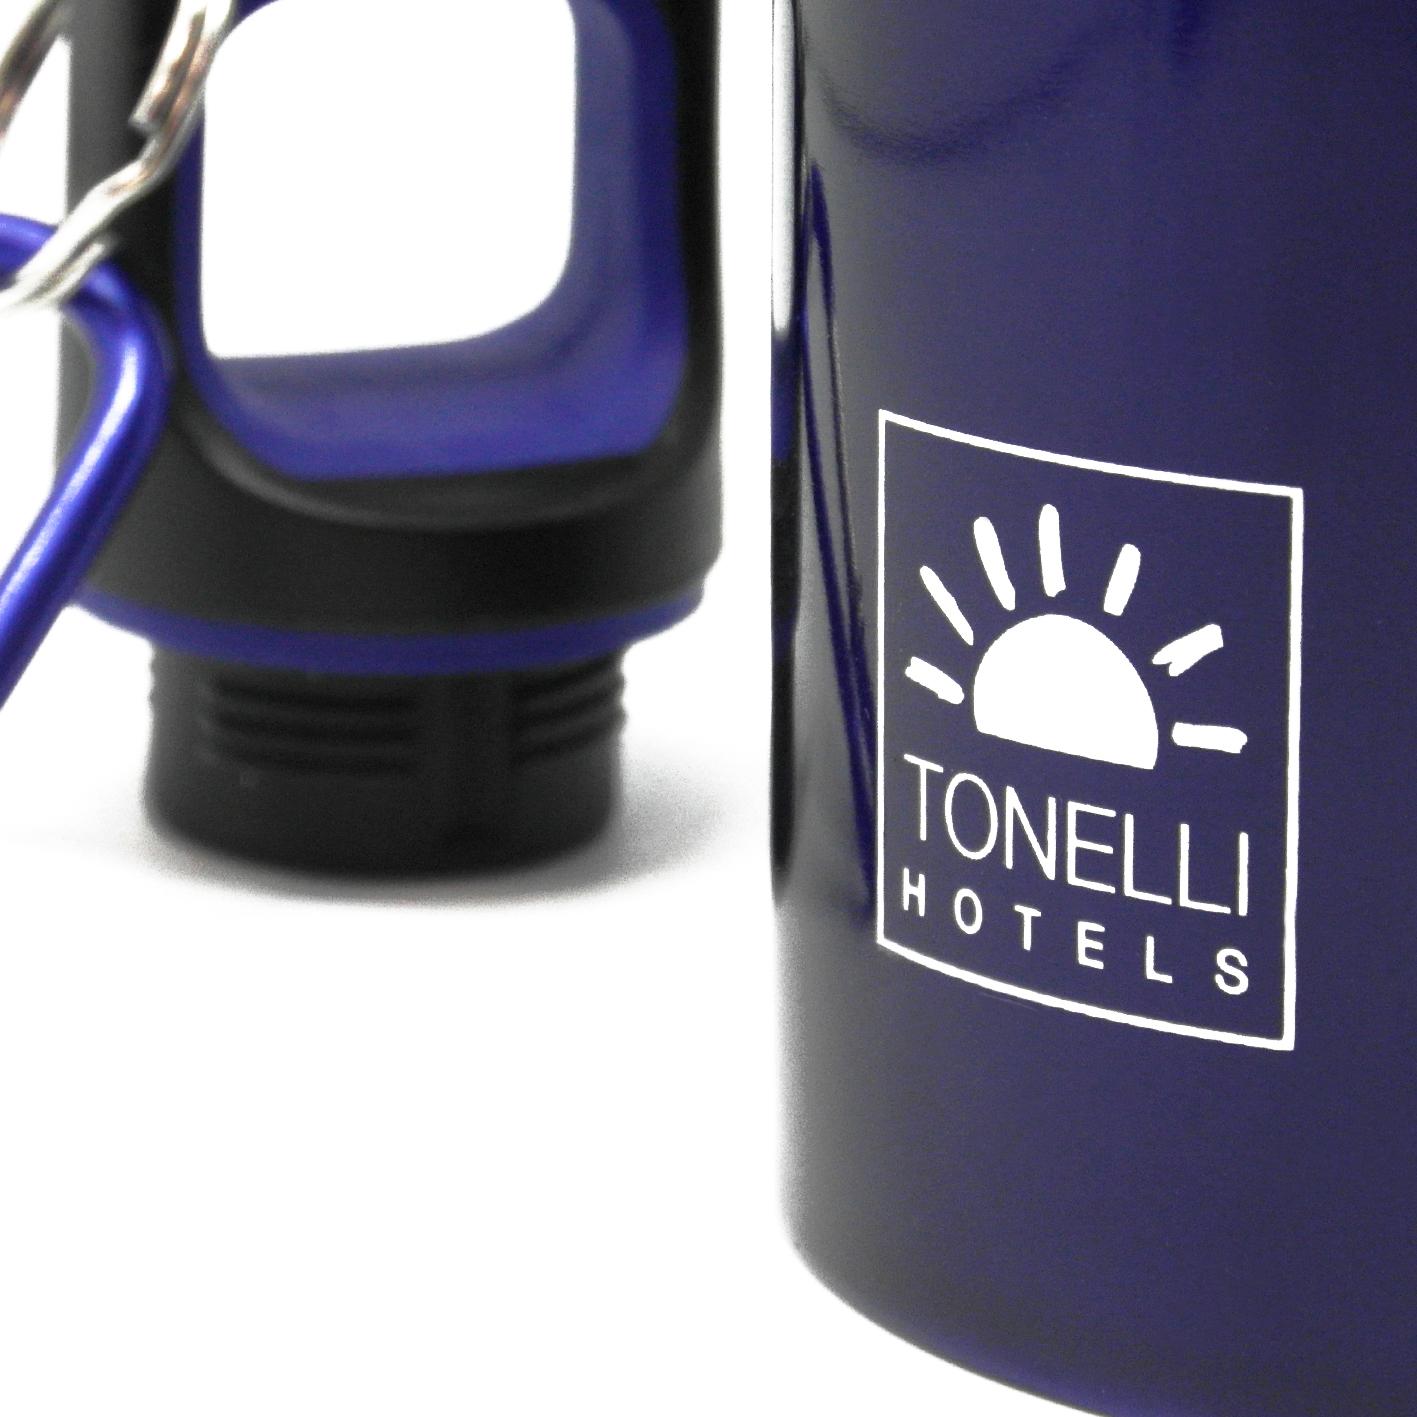 tonelli-hotels-borraccia